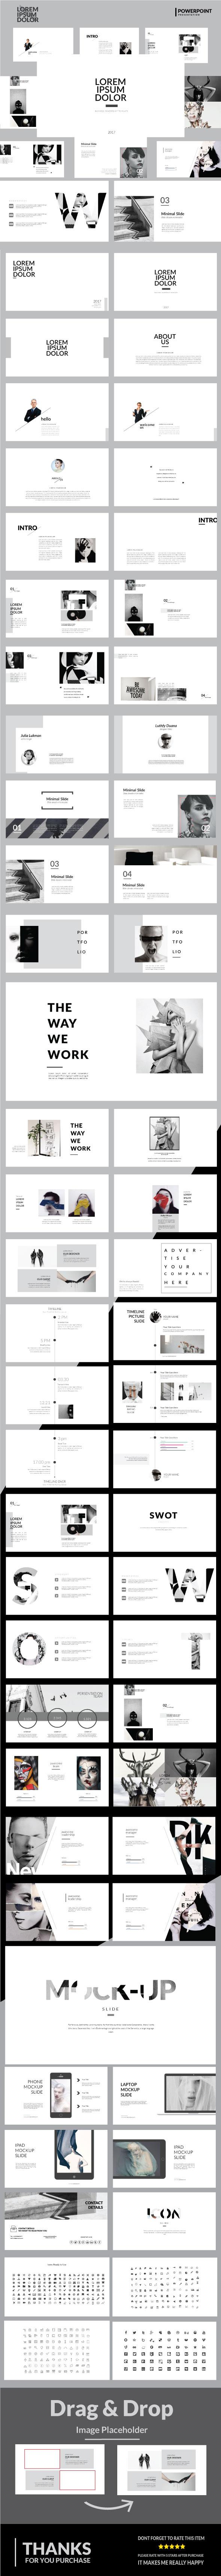 Lorem Ipsum - Google Slide Presentation Templates - Google Slides Presentation Templates